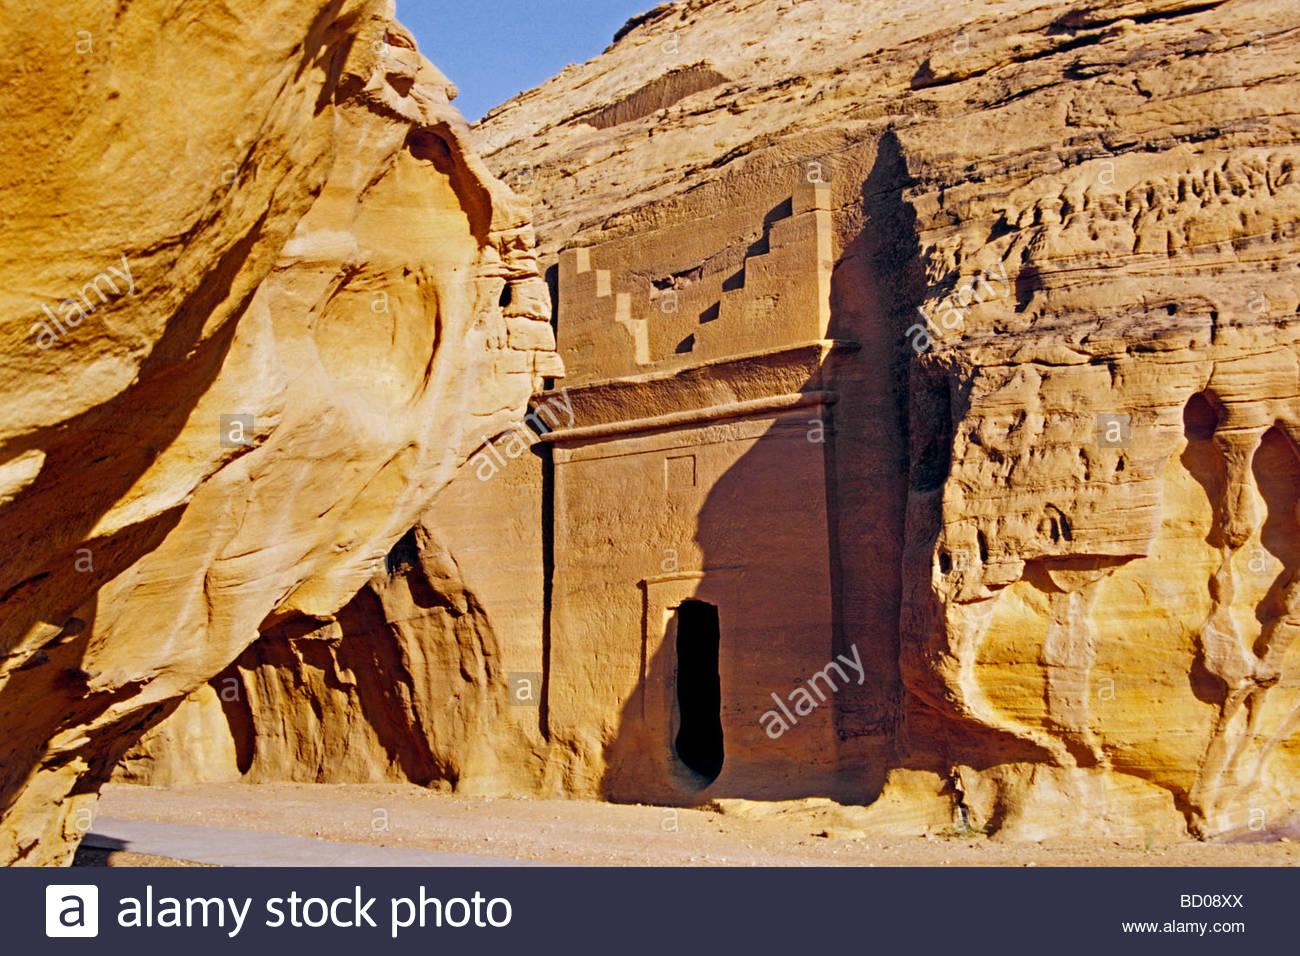 dedan necropolis, saudi arabian, asia - Stock Image